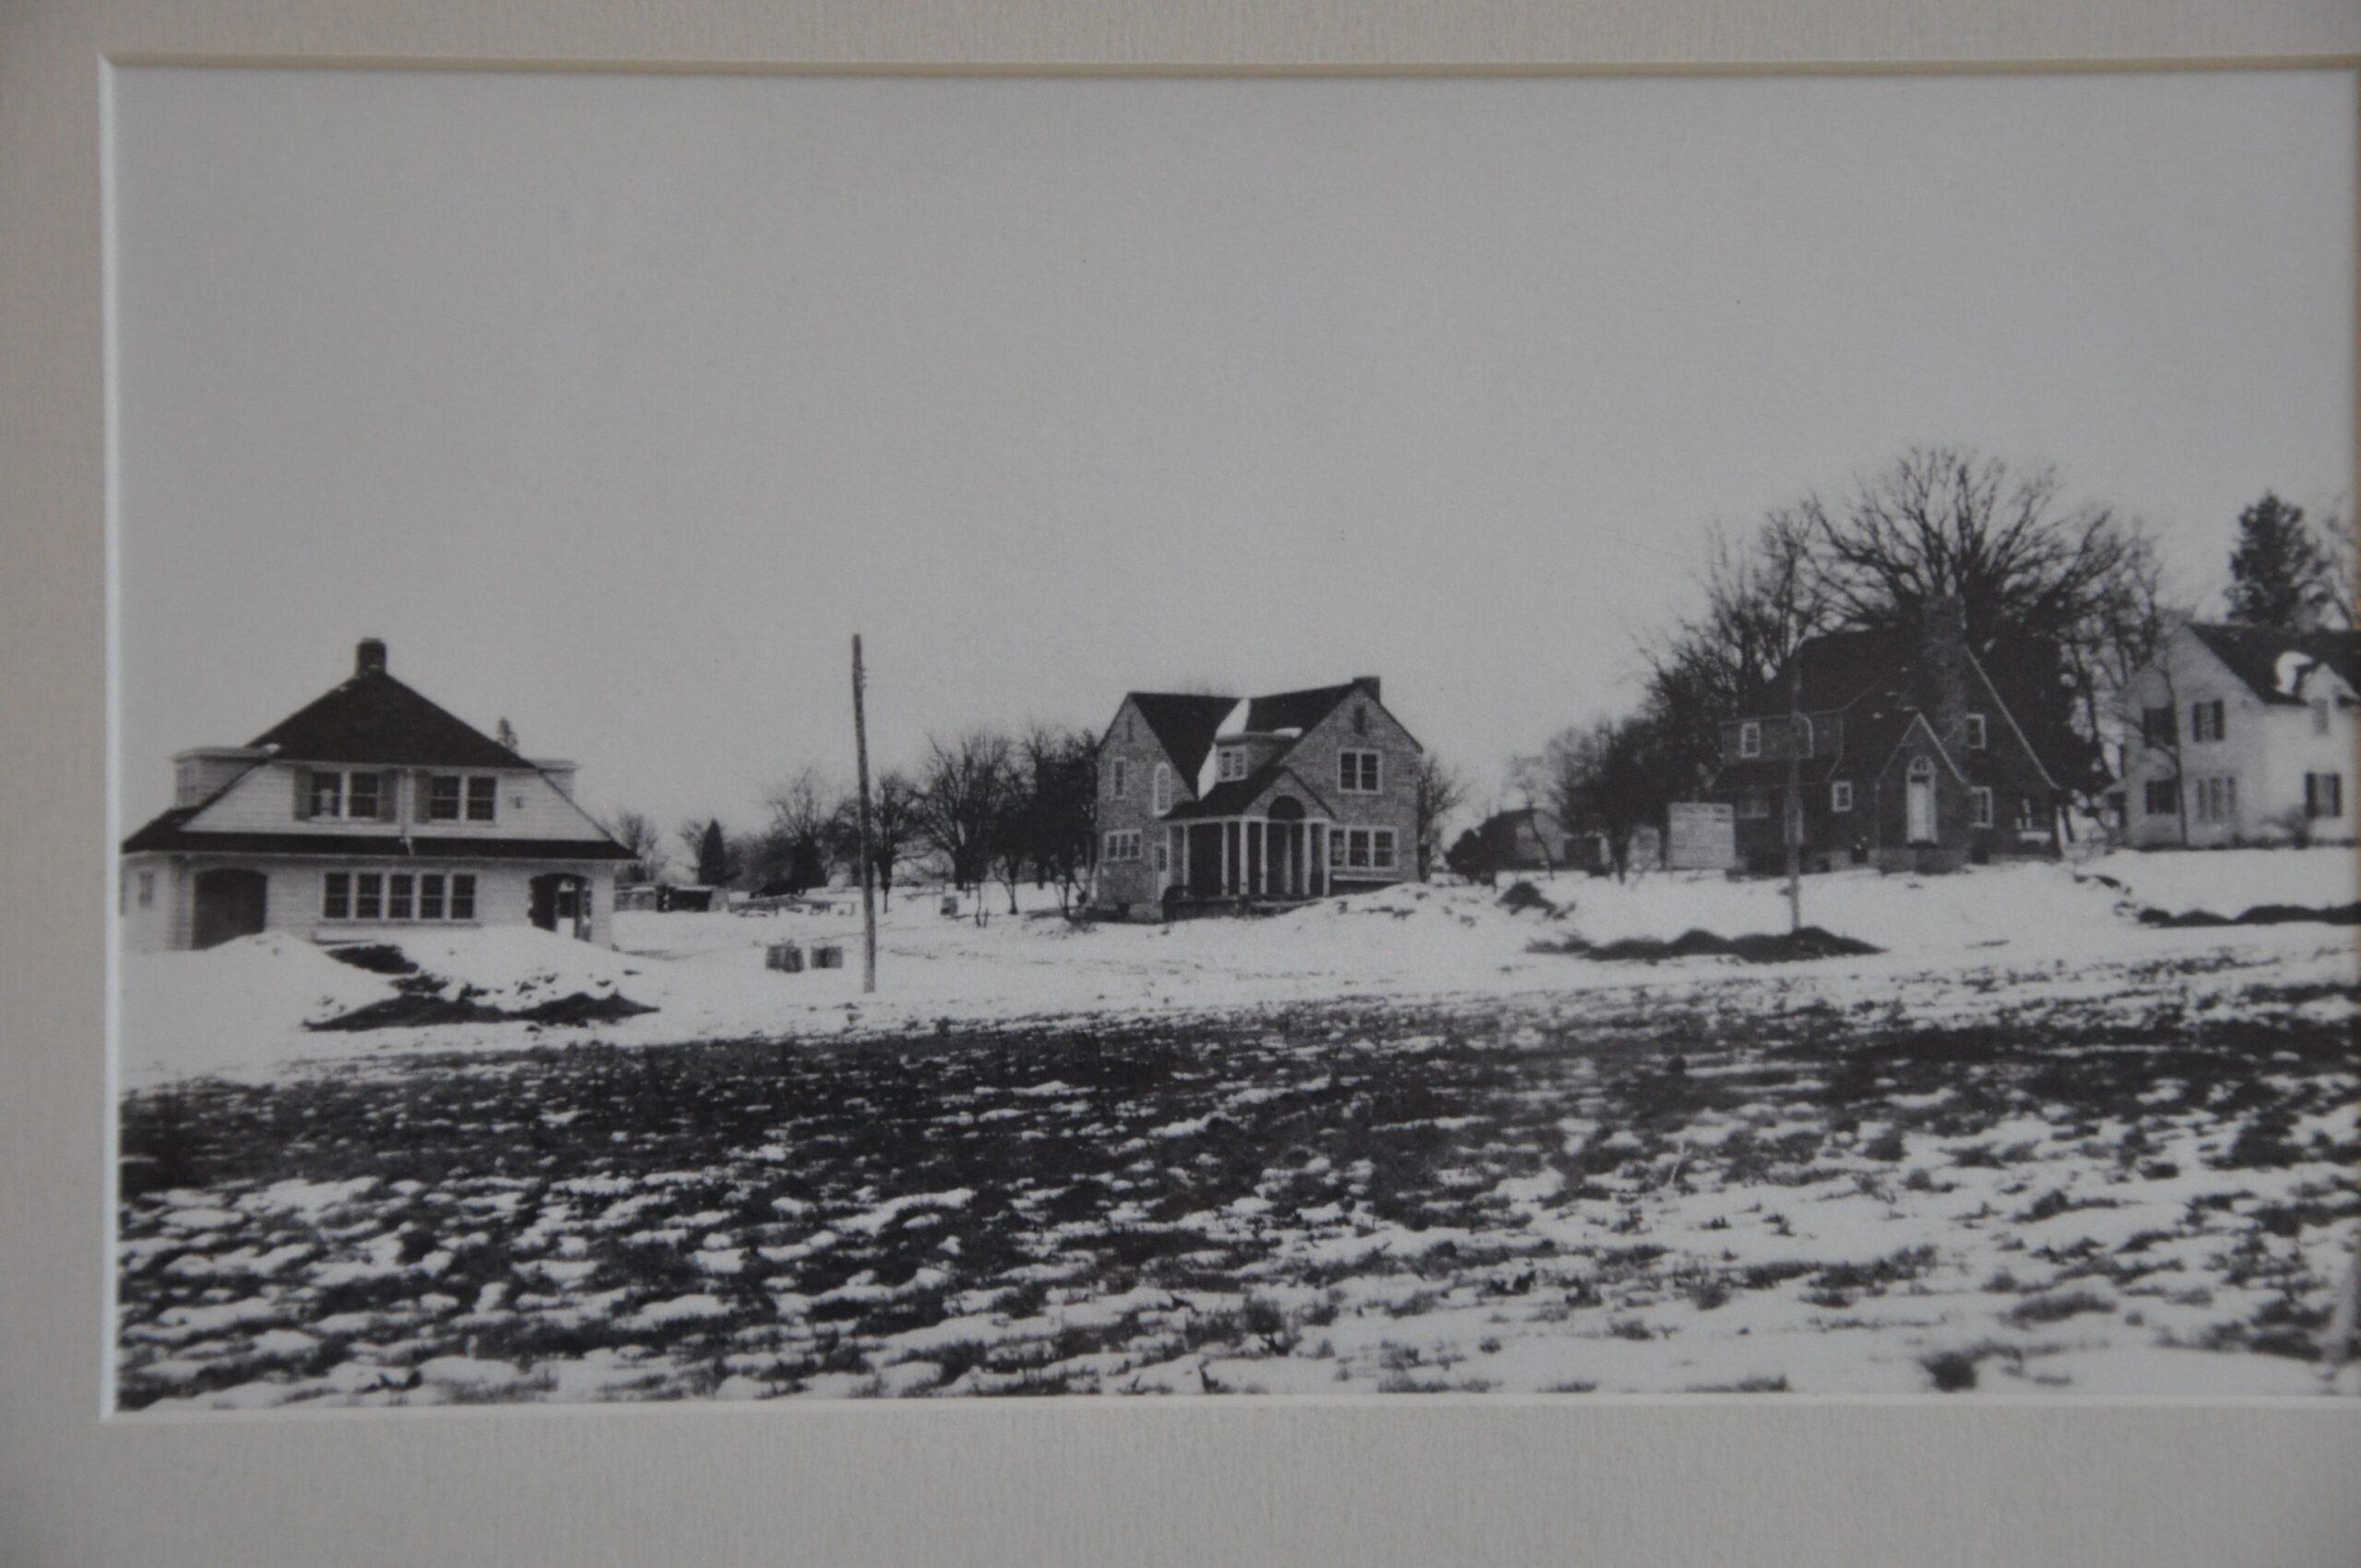 Jones farmhouse and three new houses on Quesada Street around 1926